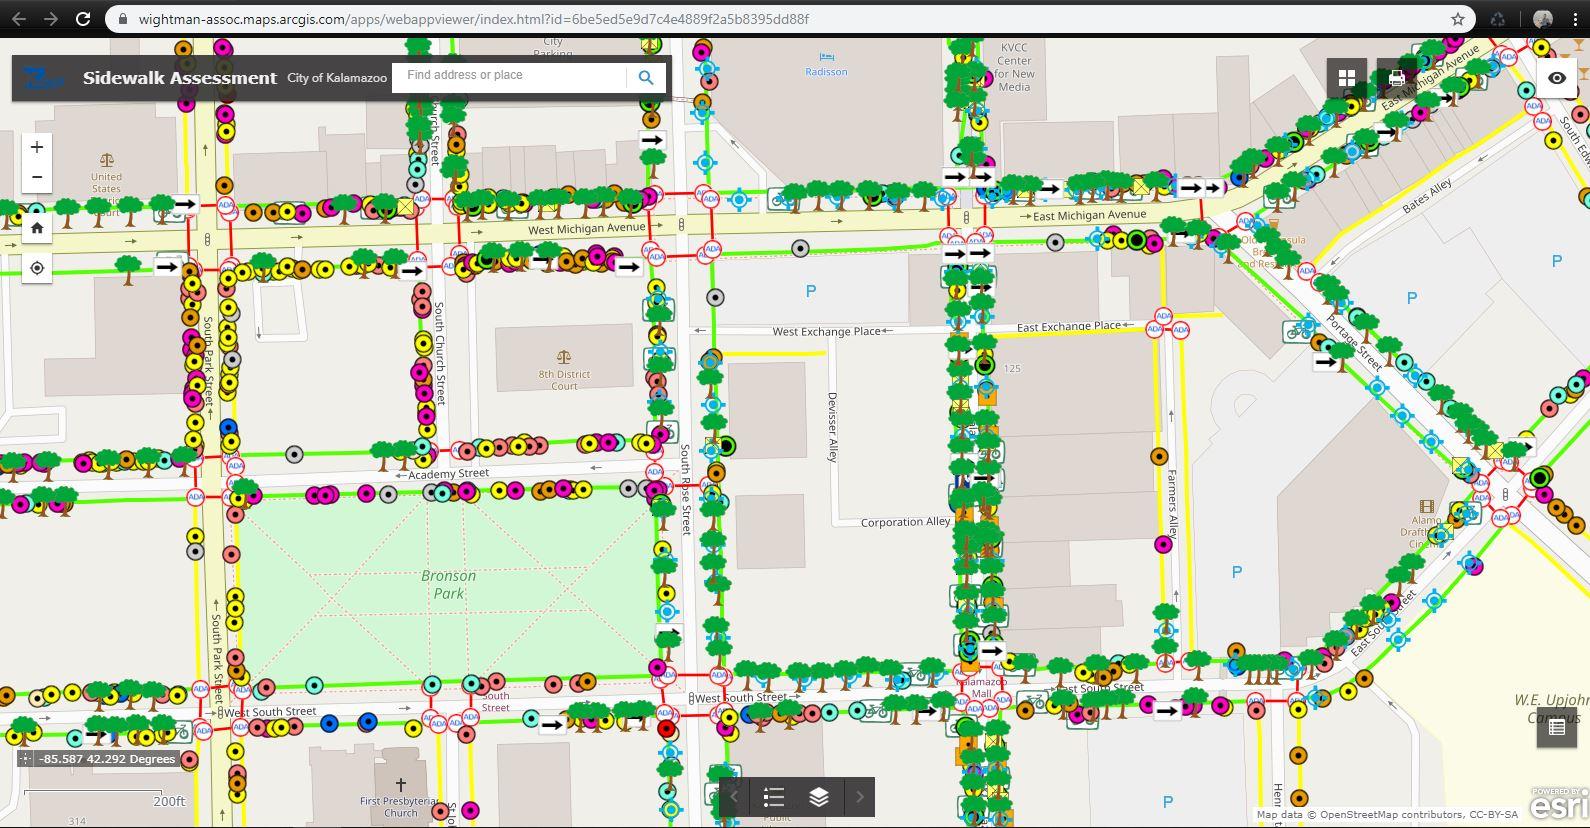 Kalamazoo Sidewalk Assessment GIS Deliverable